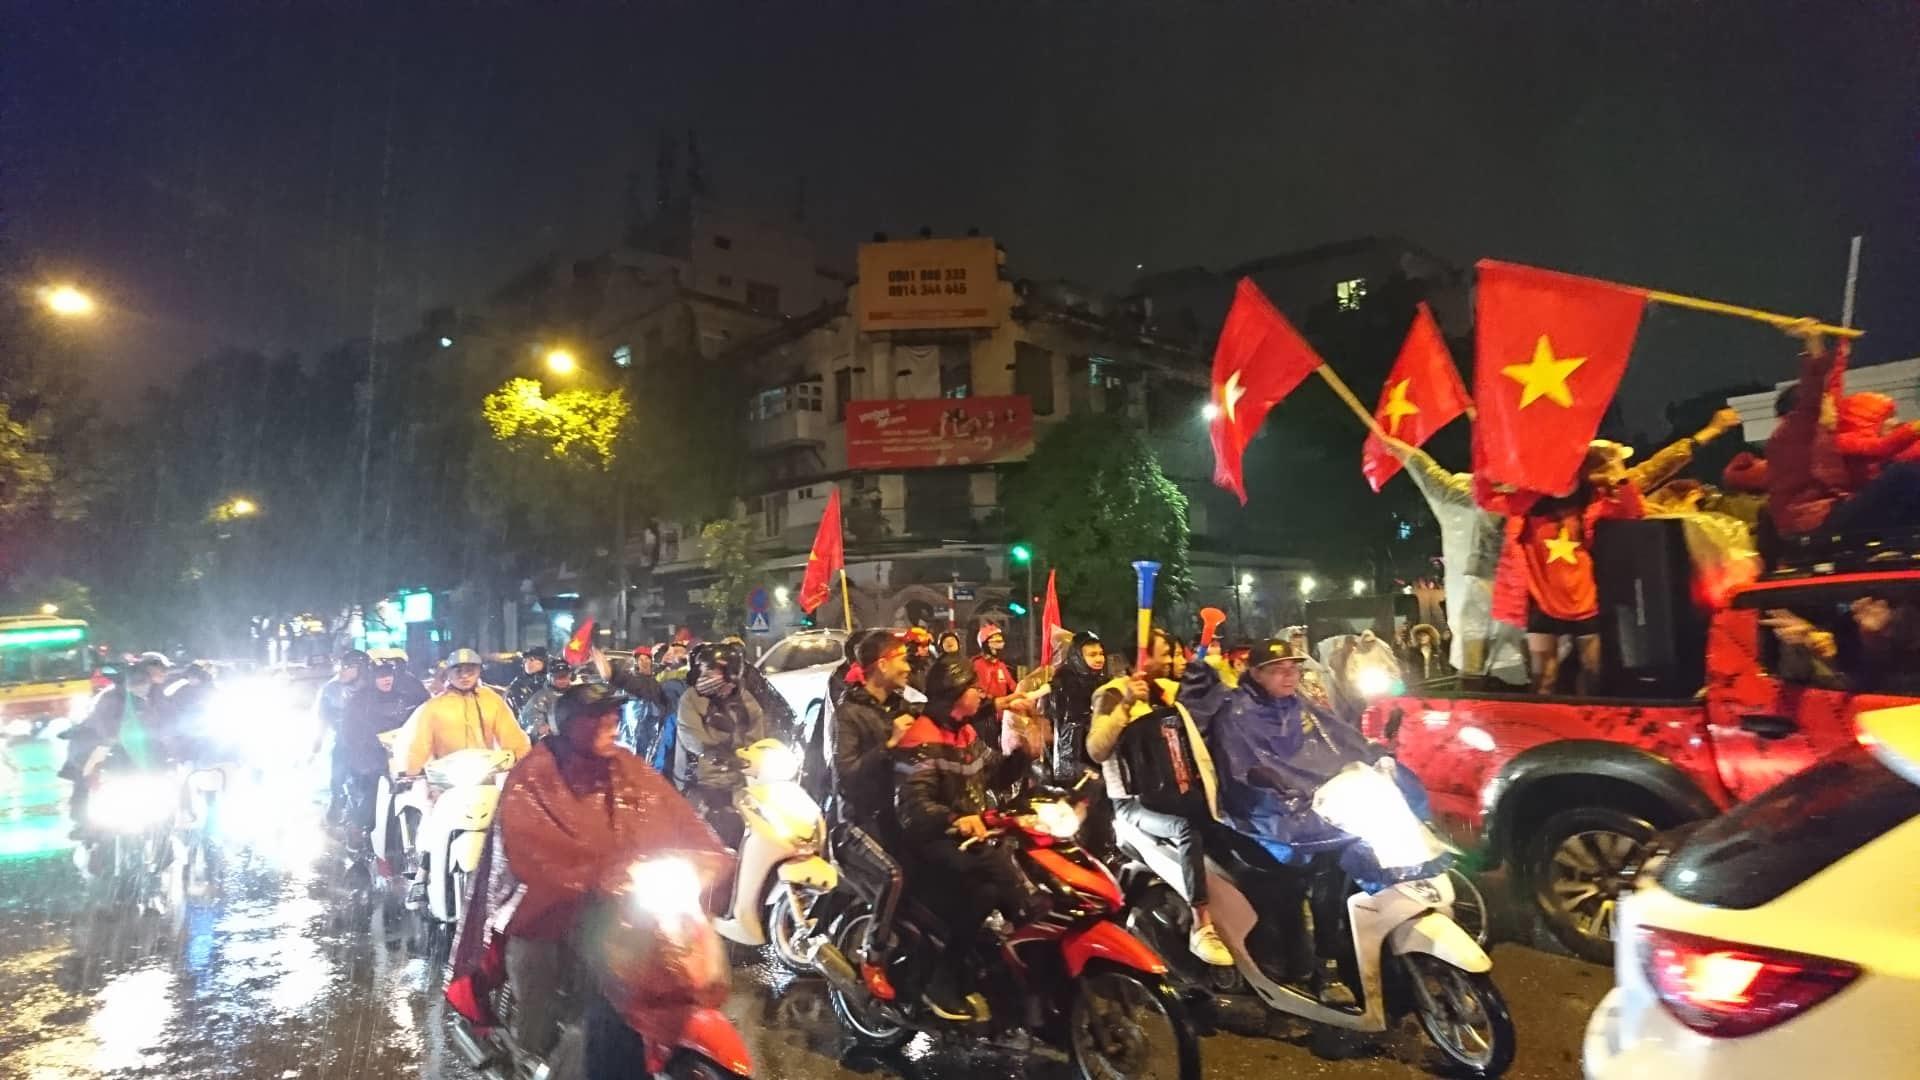 Tuyển Việt Nam,Tuyển Malaysia,AFF Cup,HLV Park Hang Seo,chung kết AFF Cup